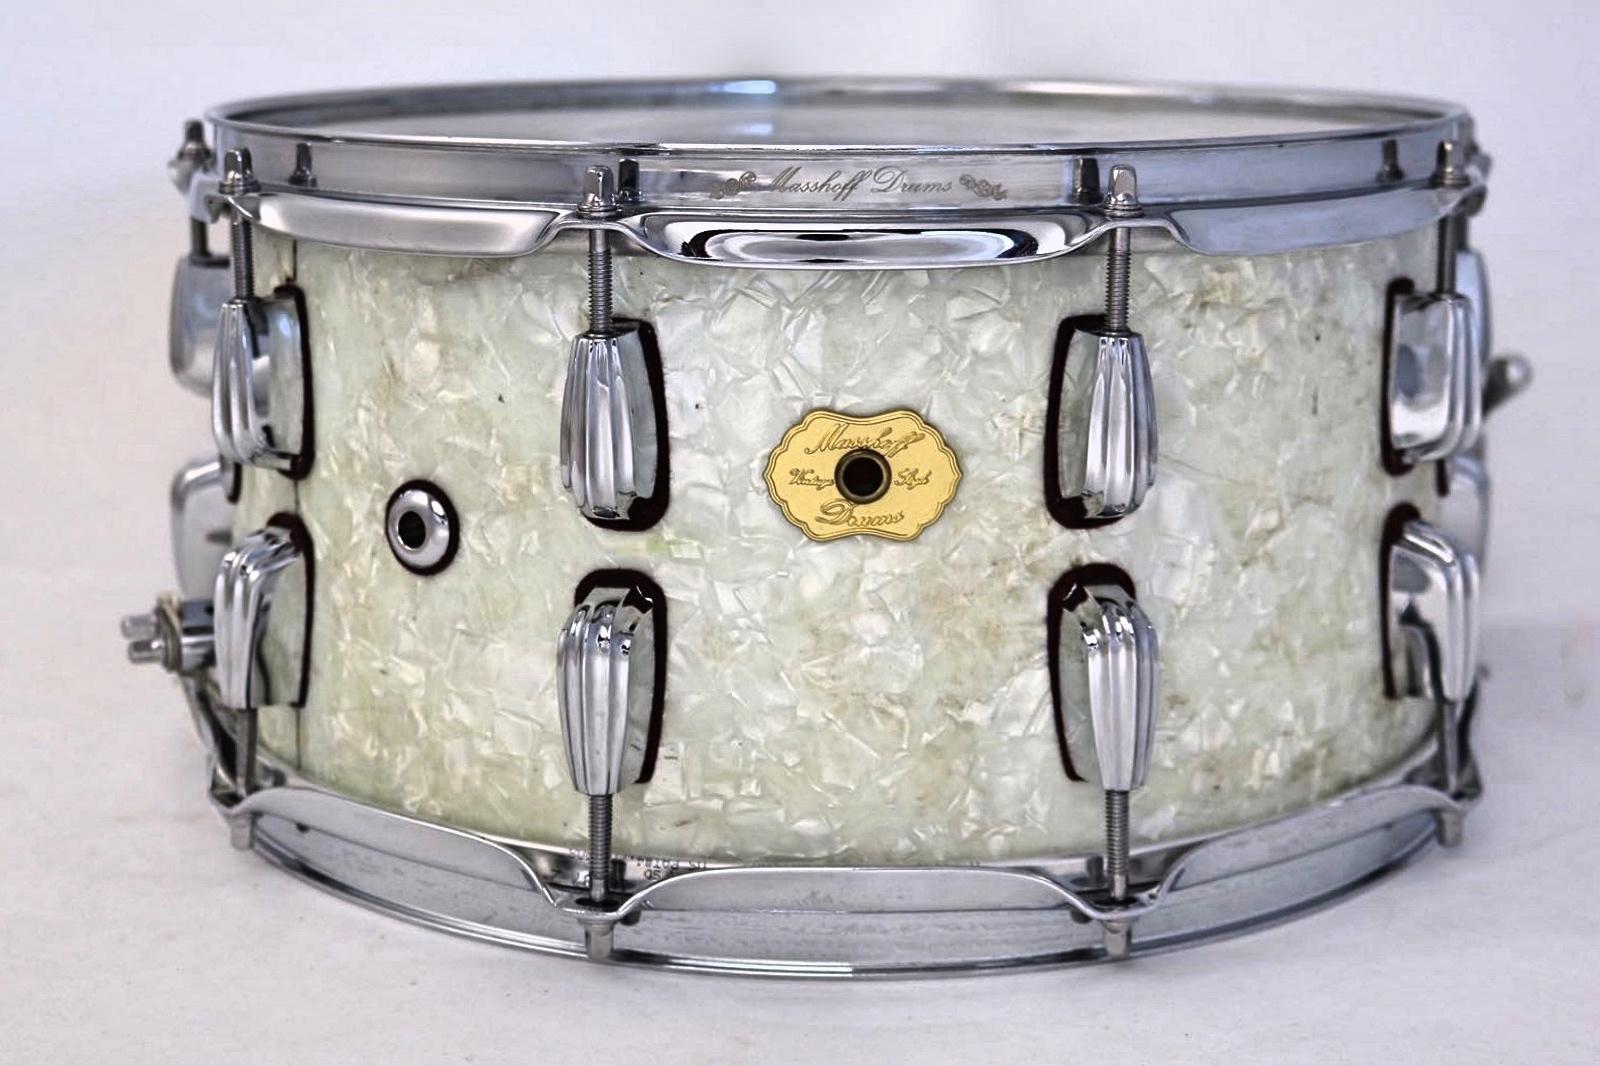 Masshoff Drums Maple Series [configurator]